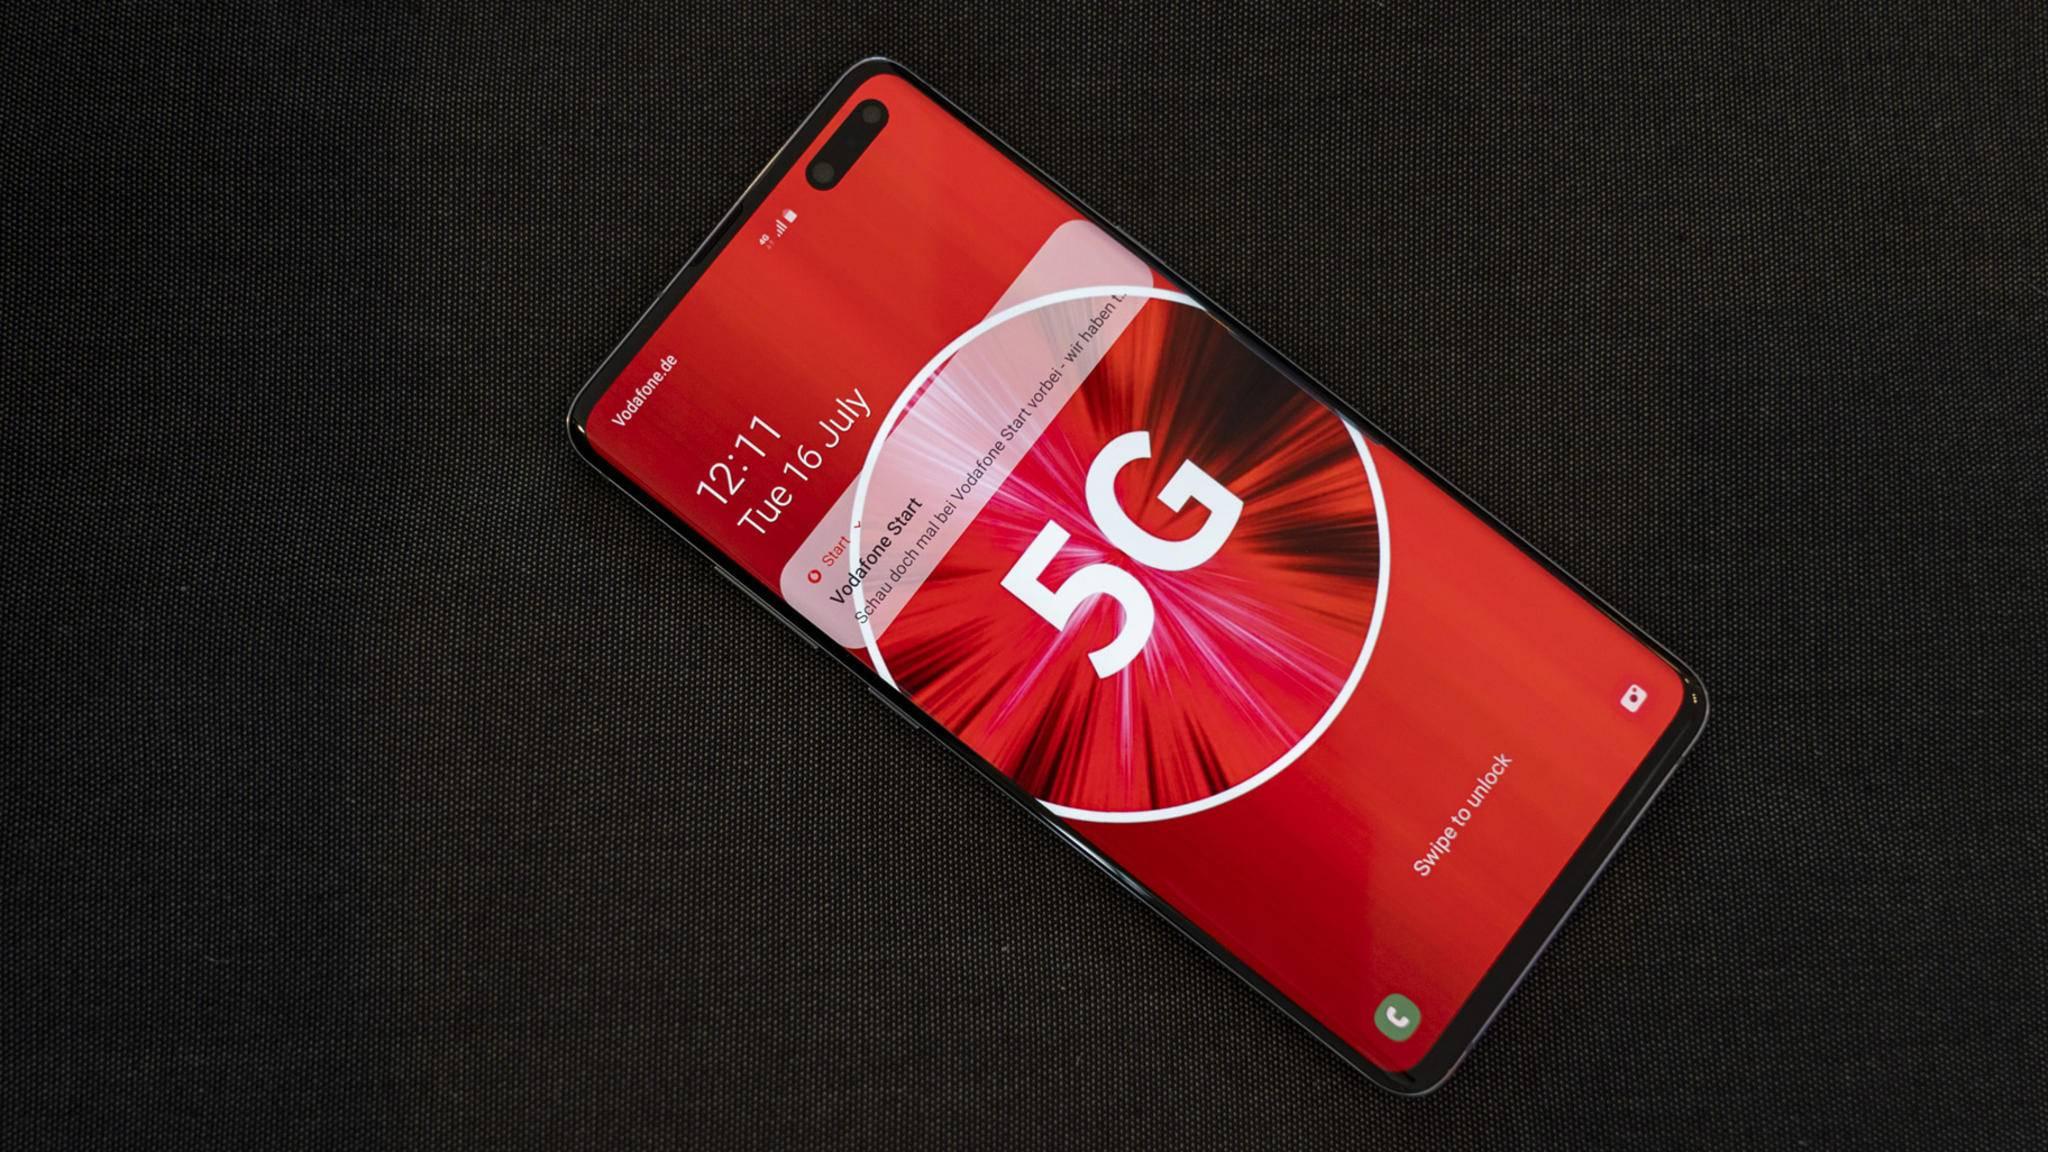 5G Vodafone